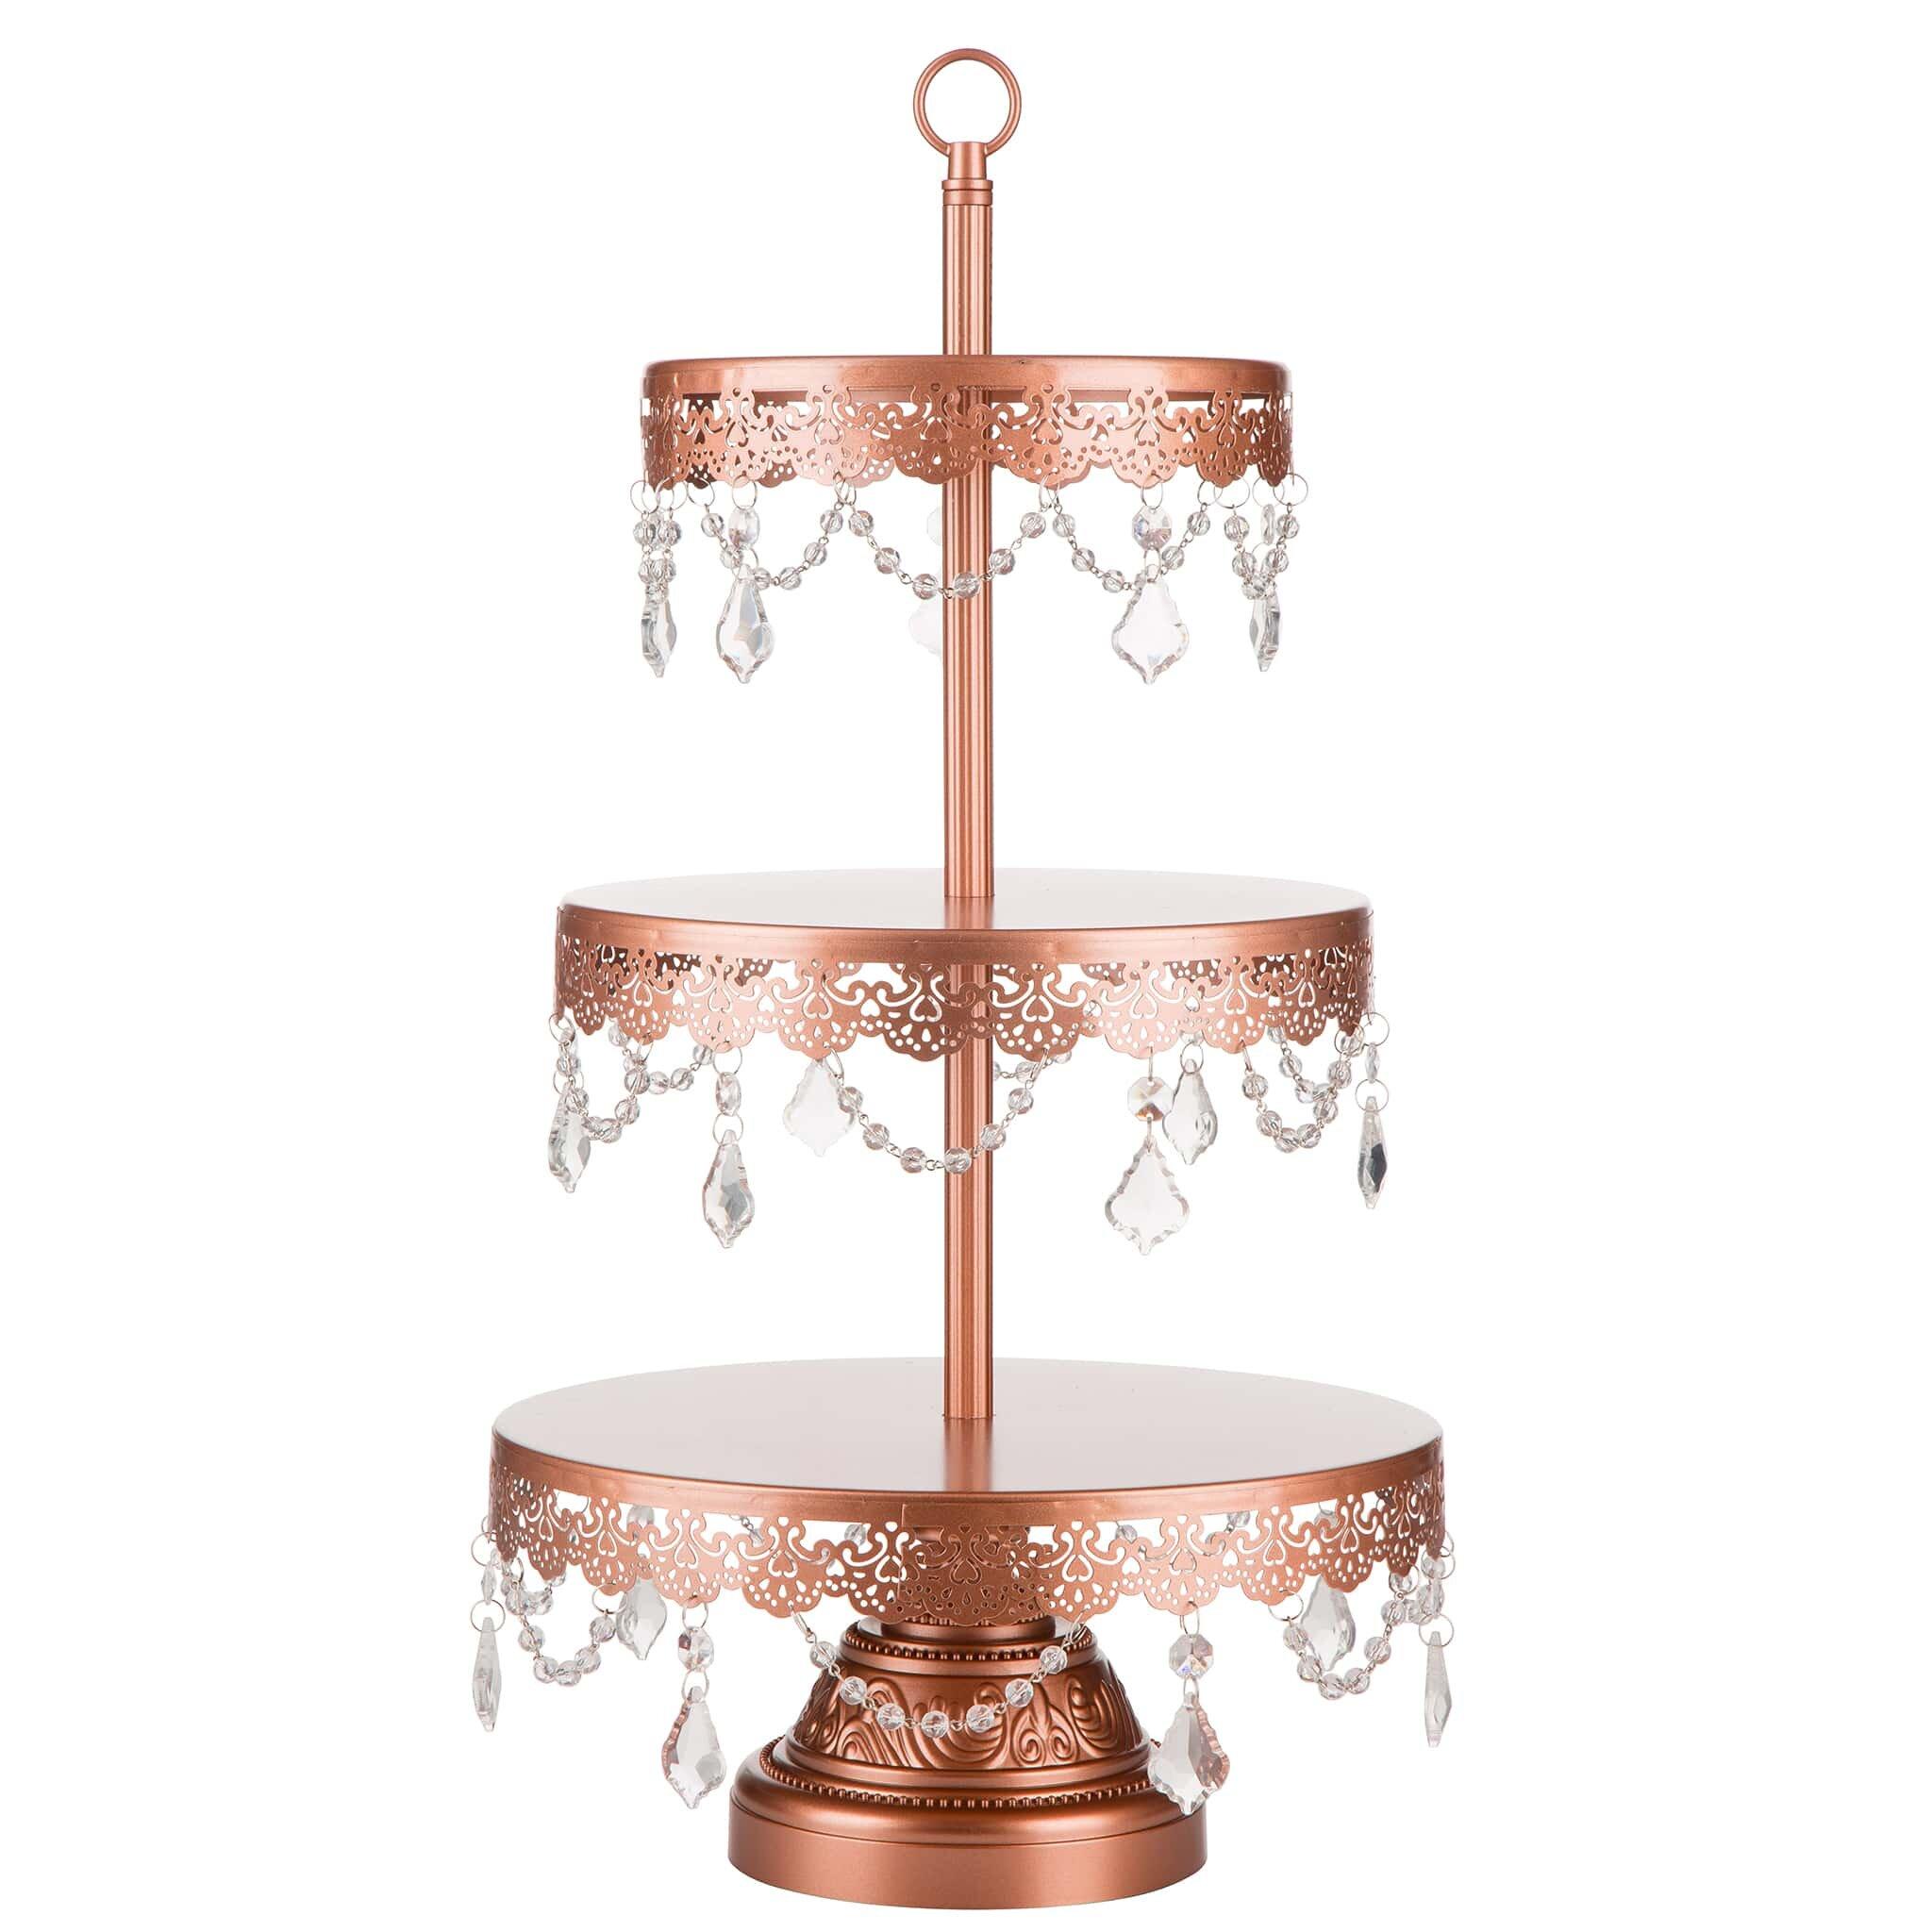 sophia 3 tier metal cupcake stand wayfair. Black Bedroom Furniture Sets. Home Design Ideas